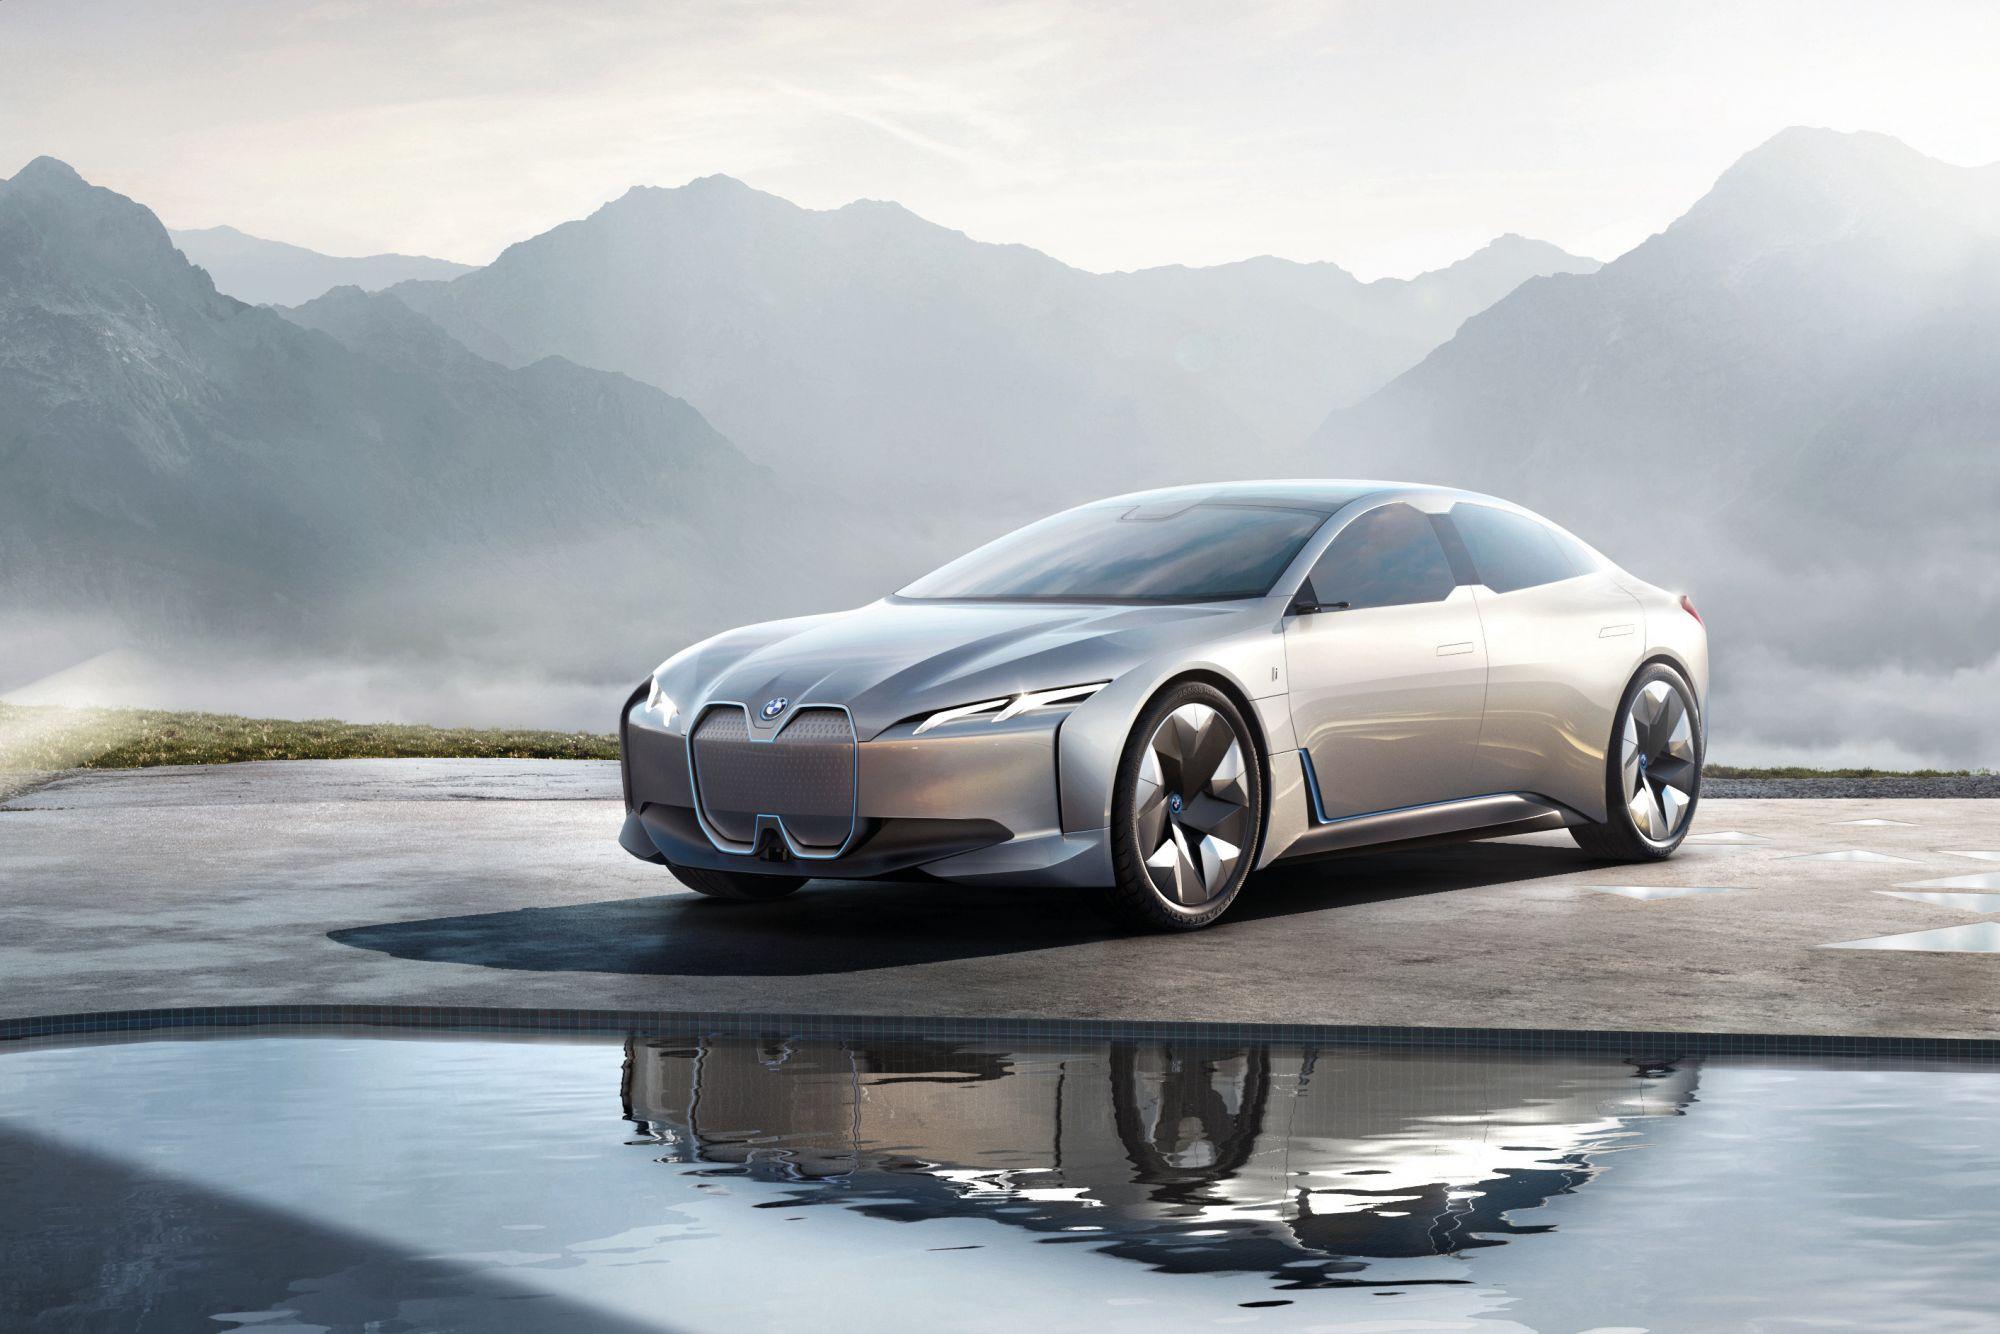 BMW總代理汎德將以「A New Form of Driving Pleasure」為主題於「2020世界新車大展」展出囊括詮釋各種形式駕馭樂趣的全新車型,其中i Vision Dynamics概念車將會是全場展車中的一大亮點